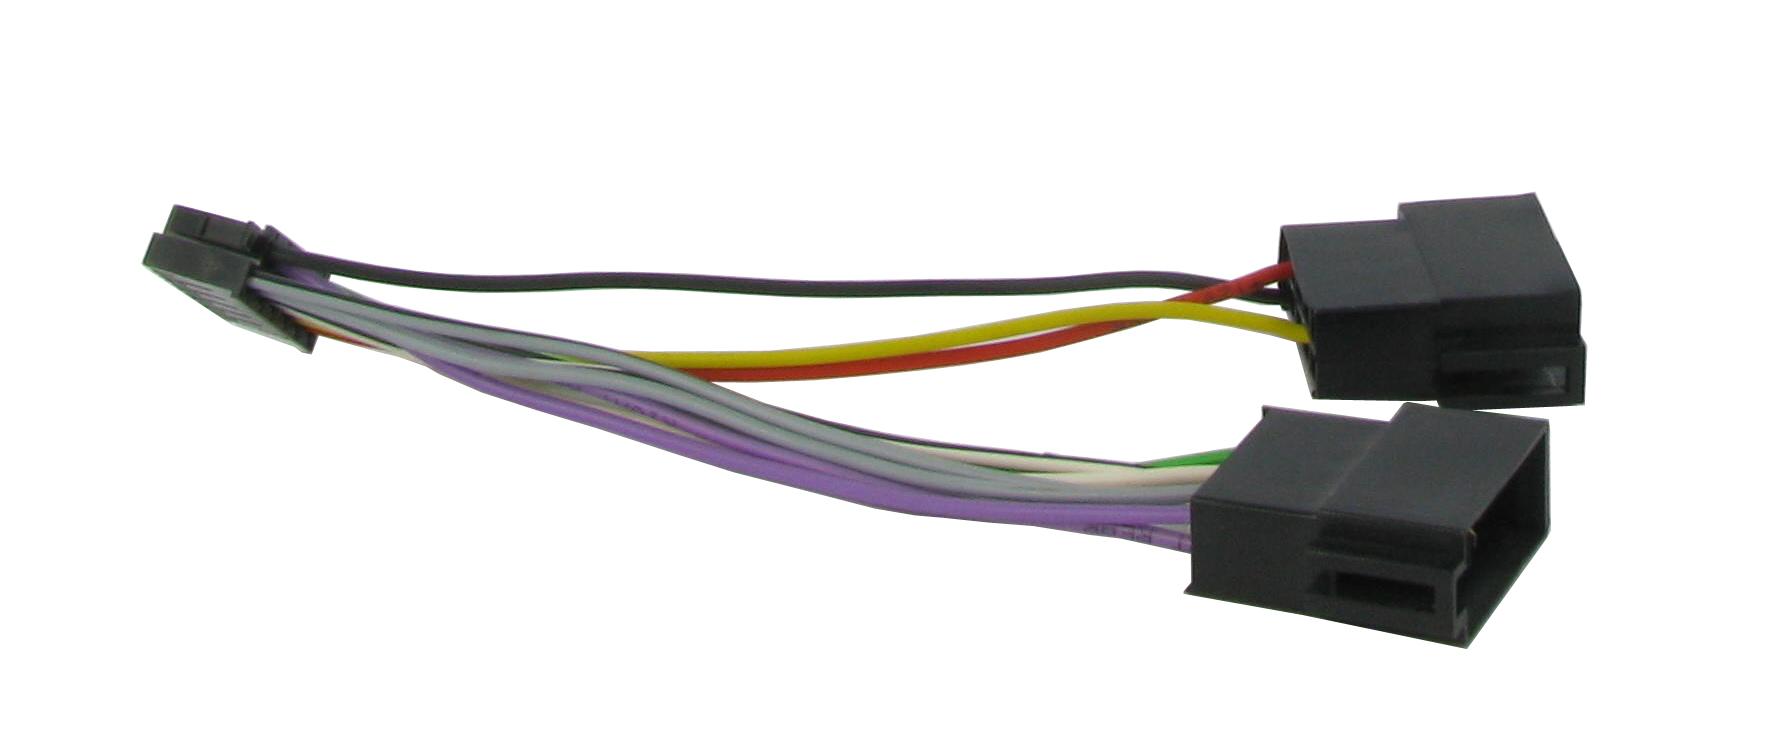 hight resolution of installer com jvc category products category ct21jv01 s installer com jvc category products category jvc kd r600 wiring harness at cita